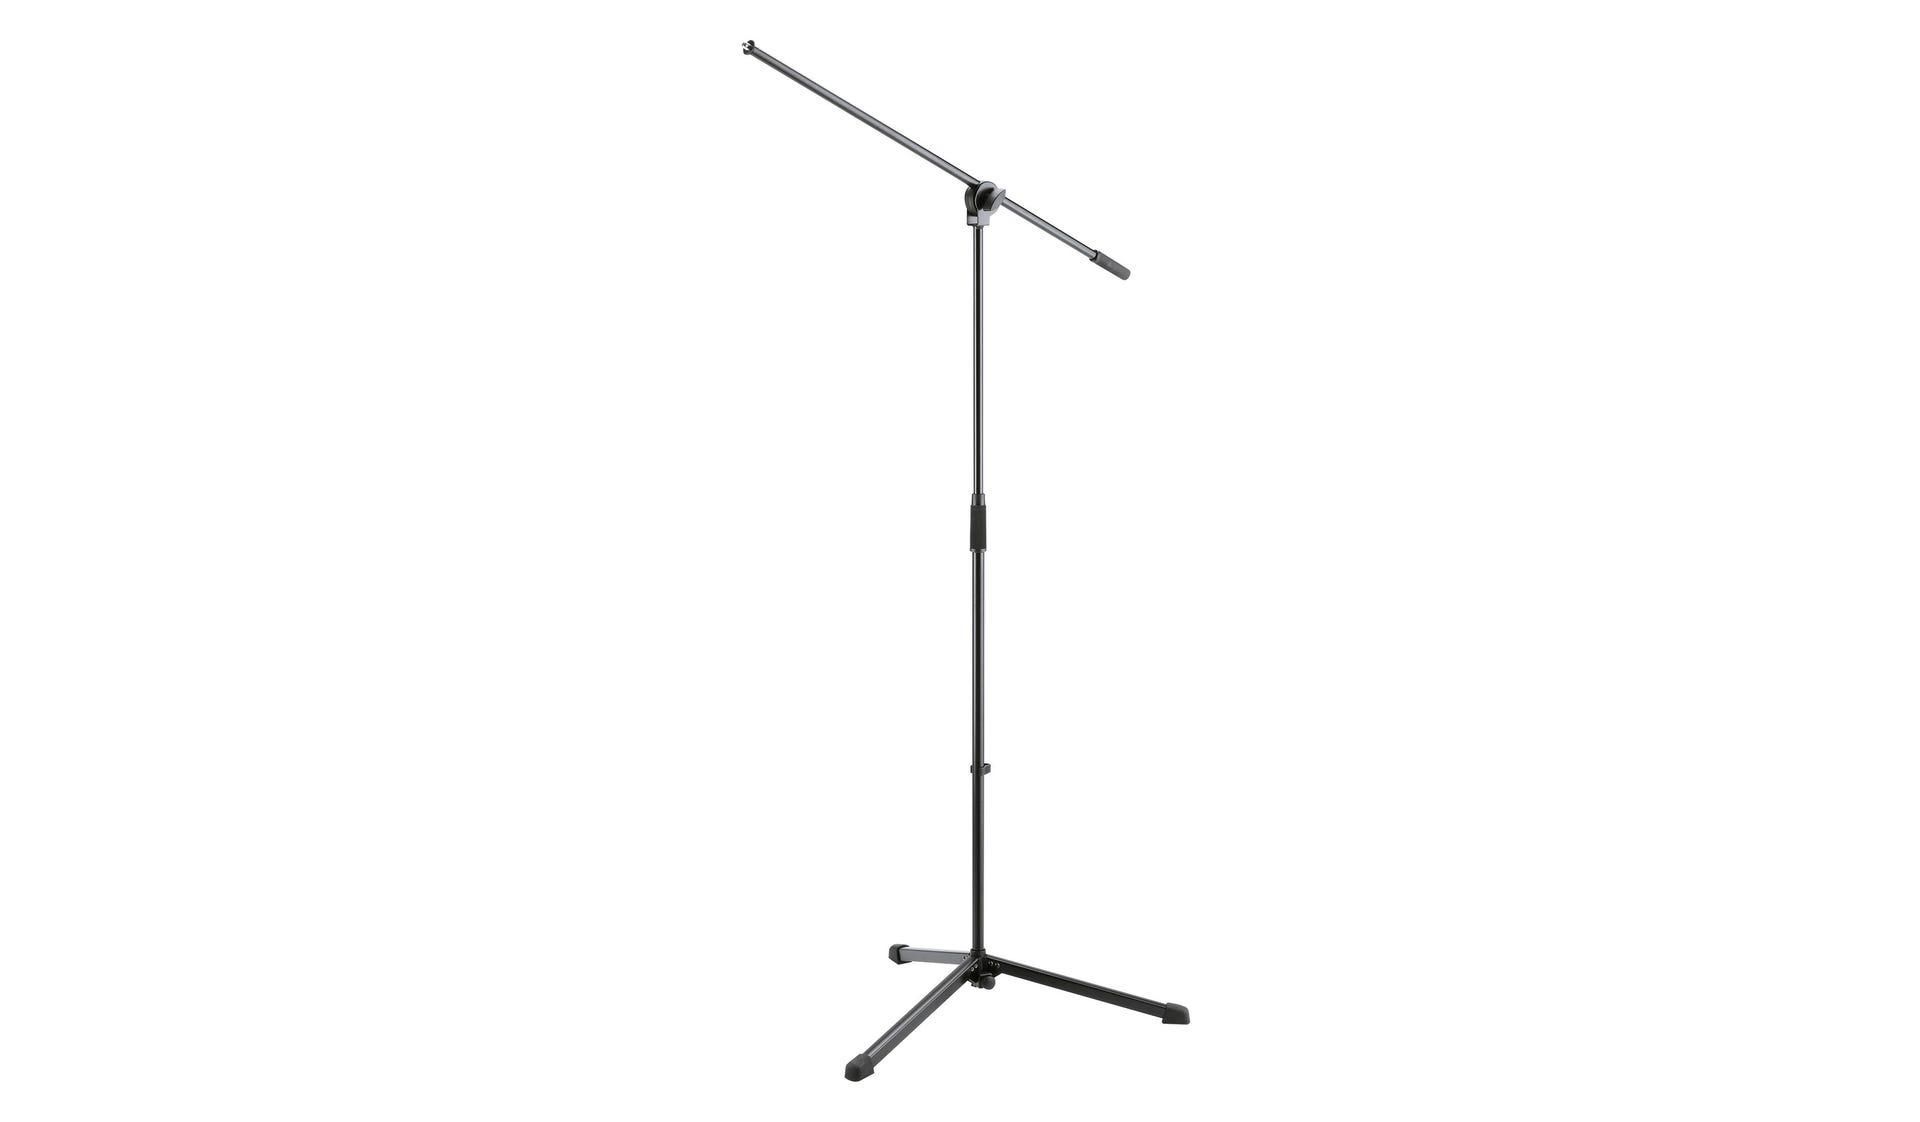 K&M Microphone Stand - Black (KM 25400)